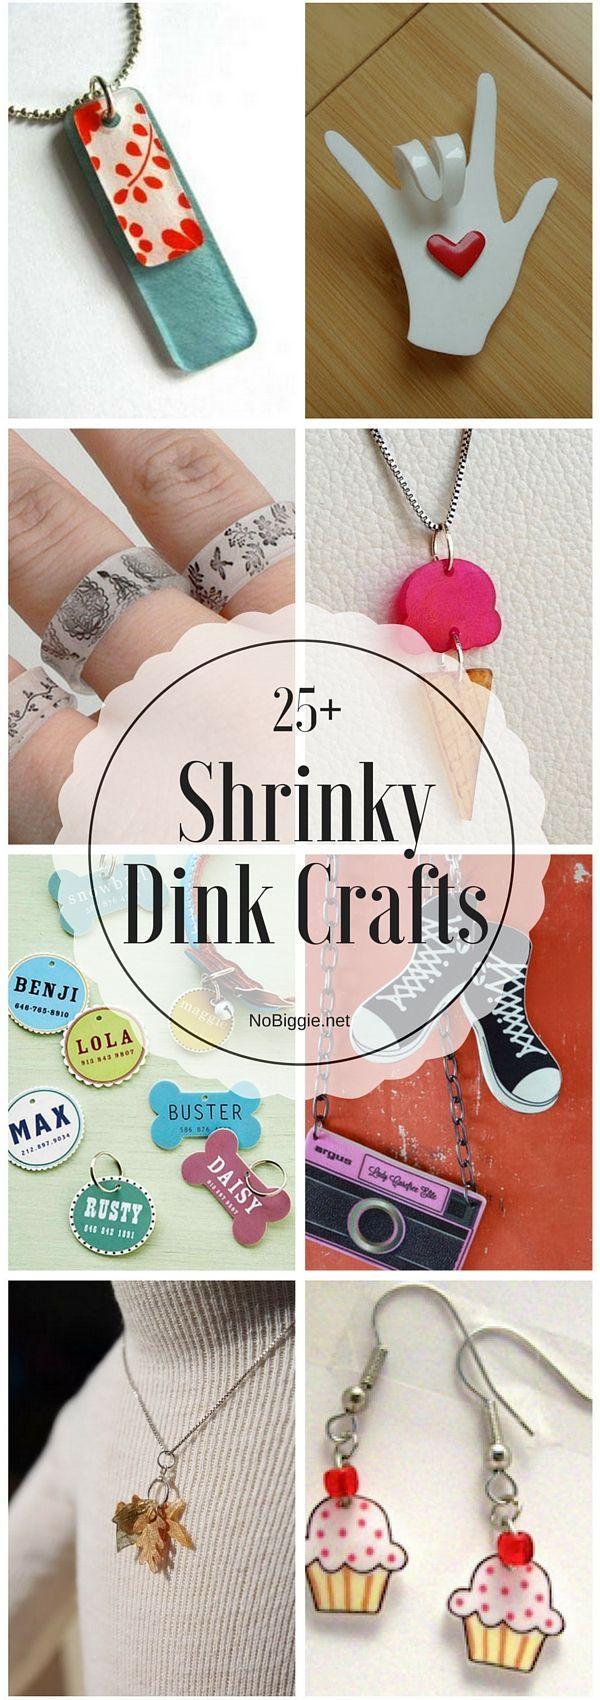 Ideas : 25+ Shrinky Dink Crafts | NoBiggie.net